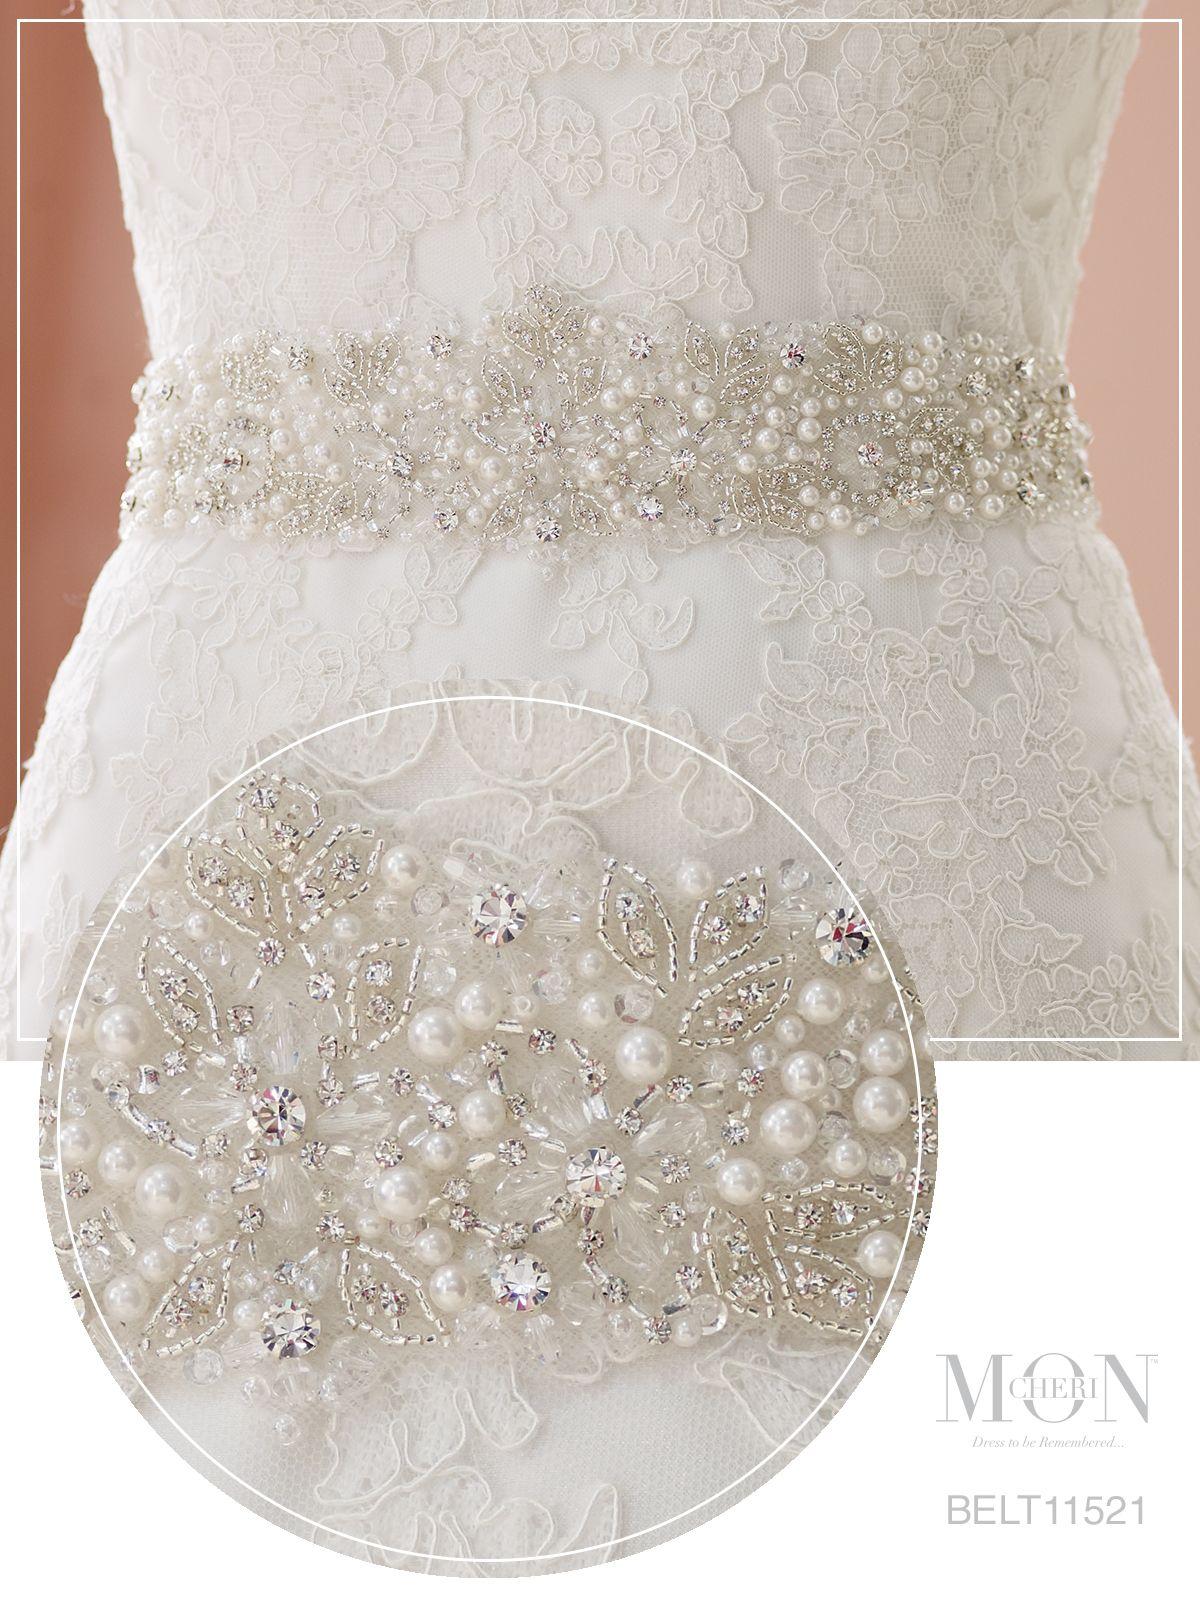 Pearl belt for wedding dress  Tracie Snow tracie on Pinterest